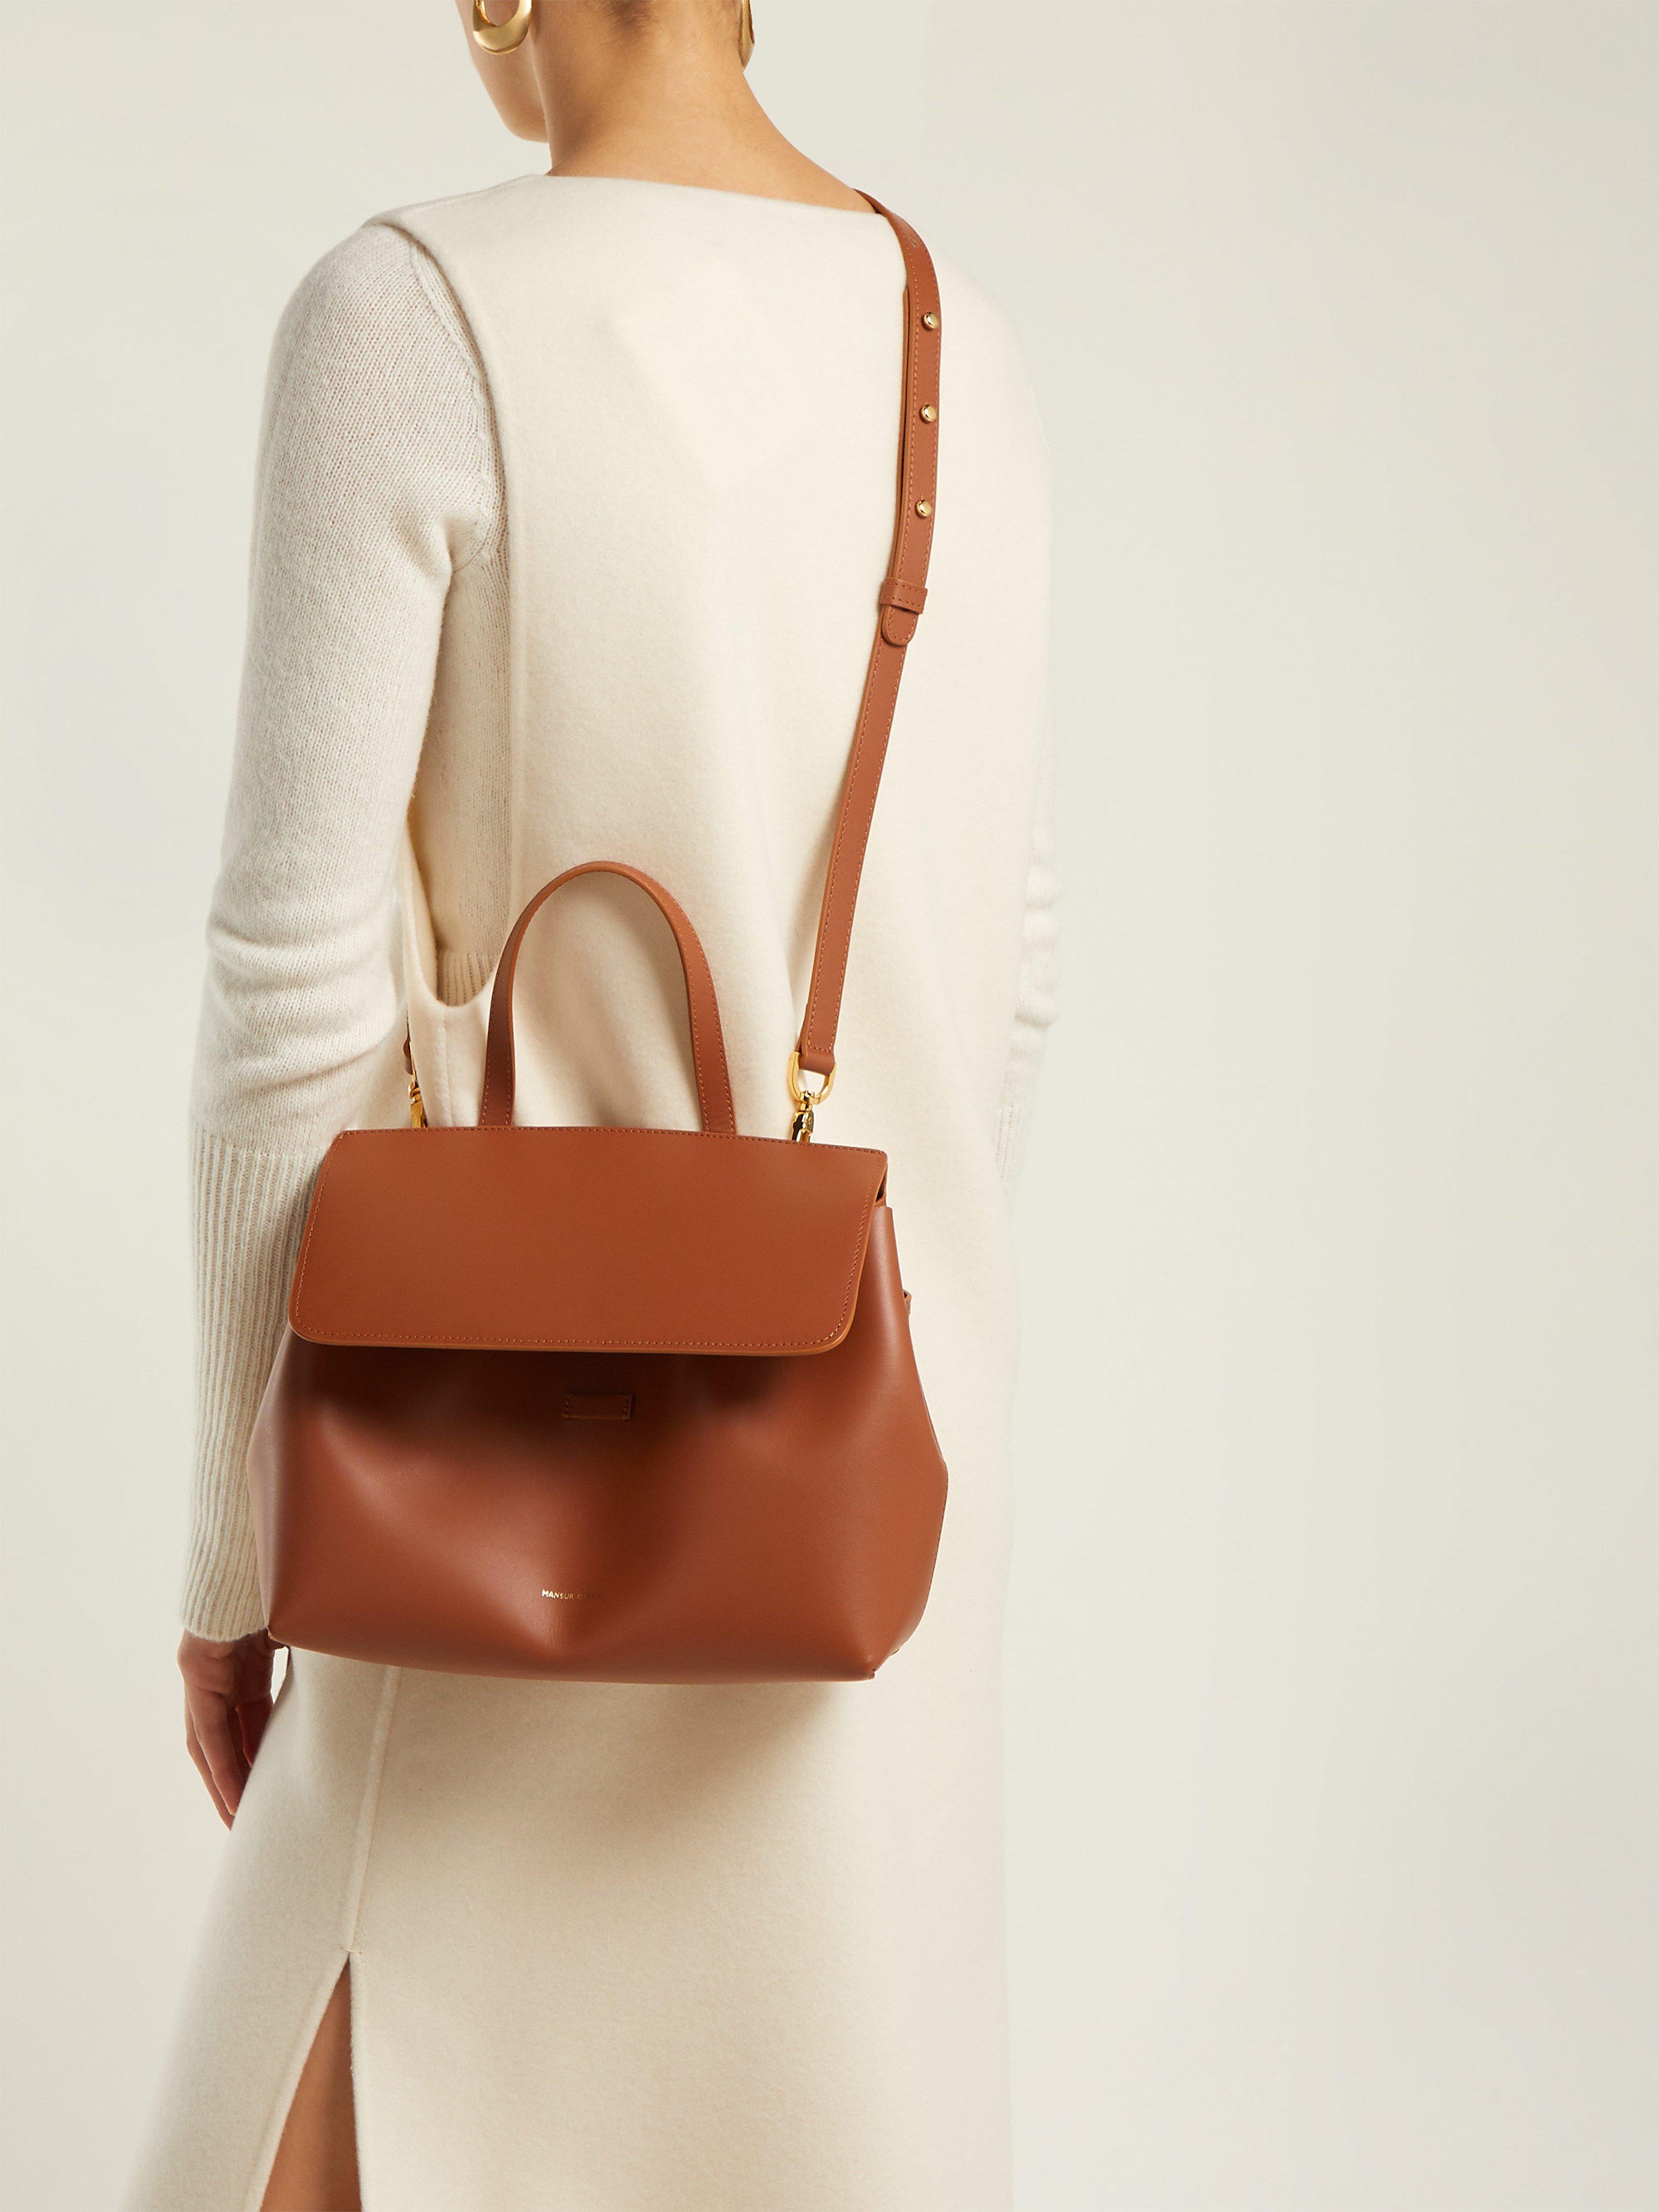 dc11b045c718 Mansur Gavriel Mini Lady Drawstring Leather Bag in Brown - Lyst